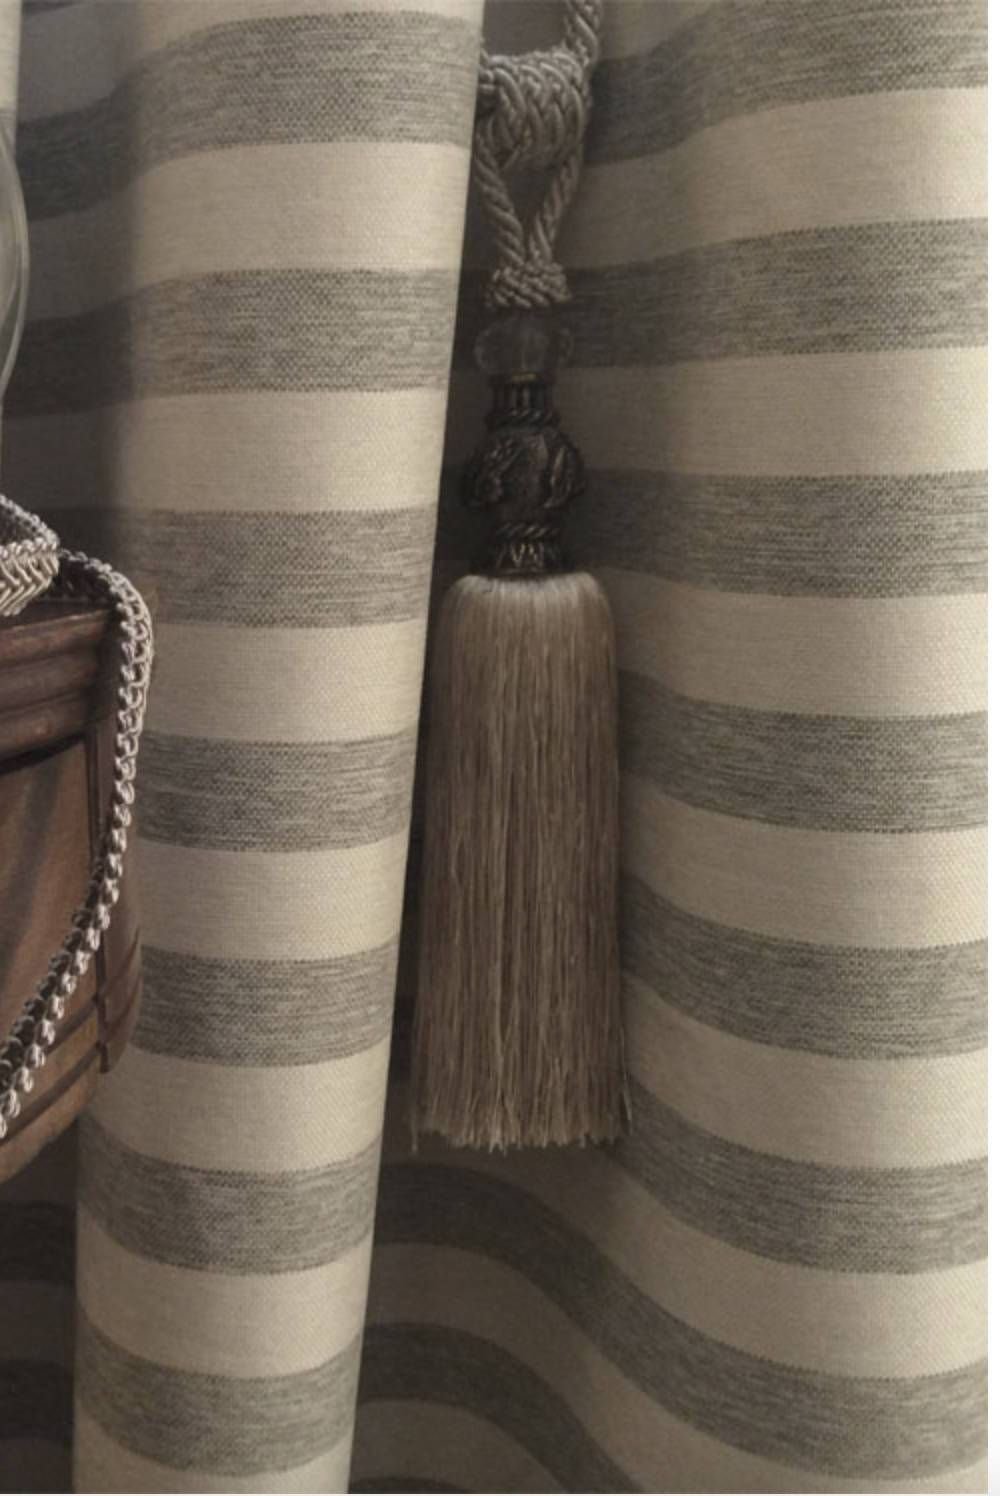 Modern Farmhouse Shower Curtain Beige Grey Stripe Ticking Tan Striped Fabric Extra Long Wide